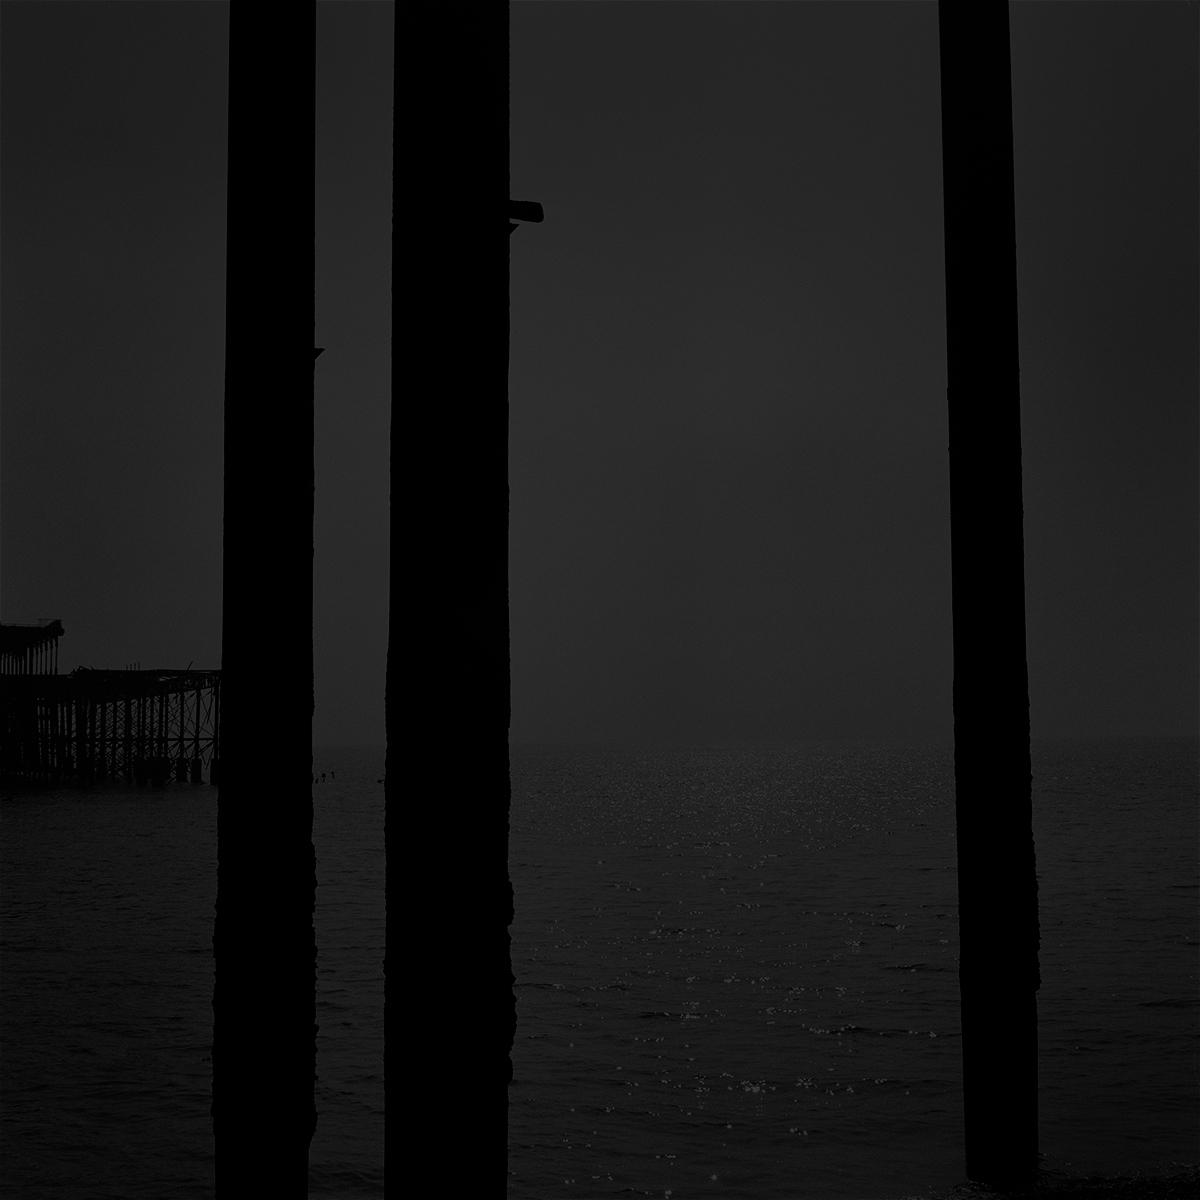 ©Patrick H. Sampson, 2014.